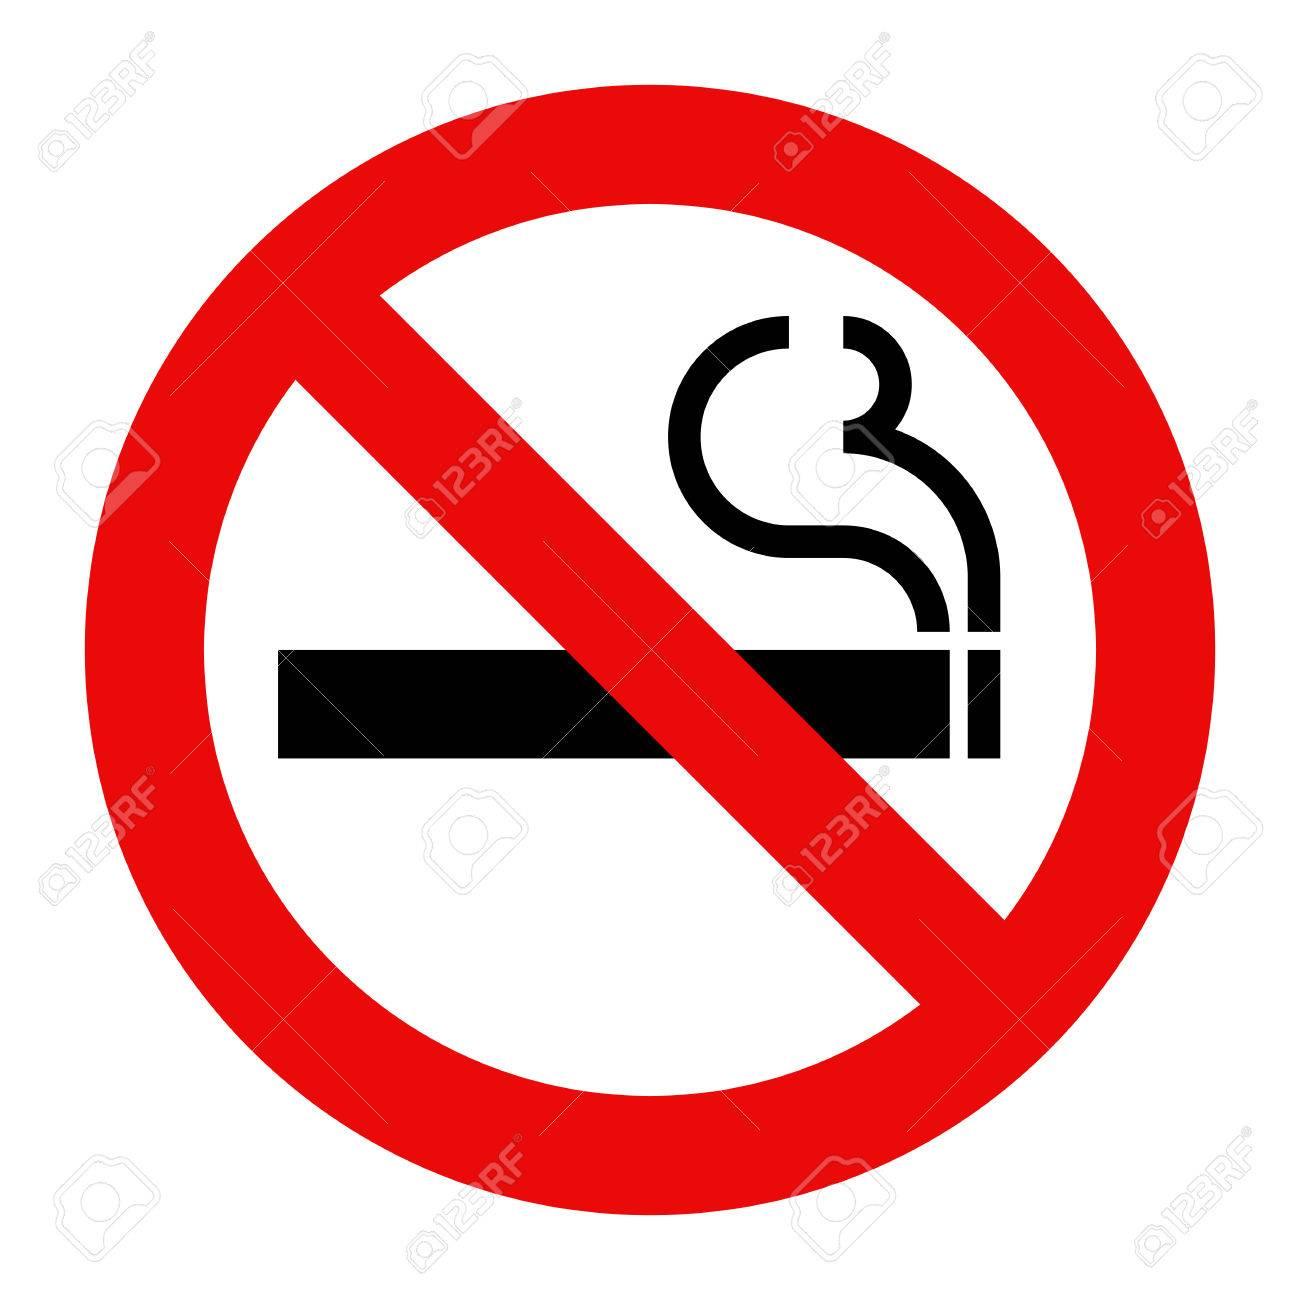 No smoking sign smoking prohibited symbol isolated on white no smoking sign smoking prohibited symbol isolated on white background stock vector 34419385 biocorpaavc Image collections